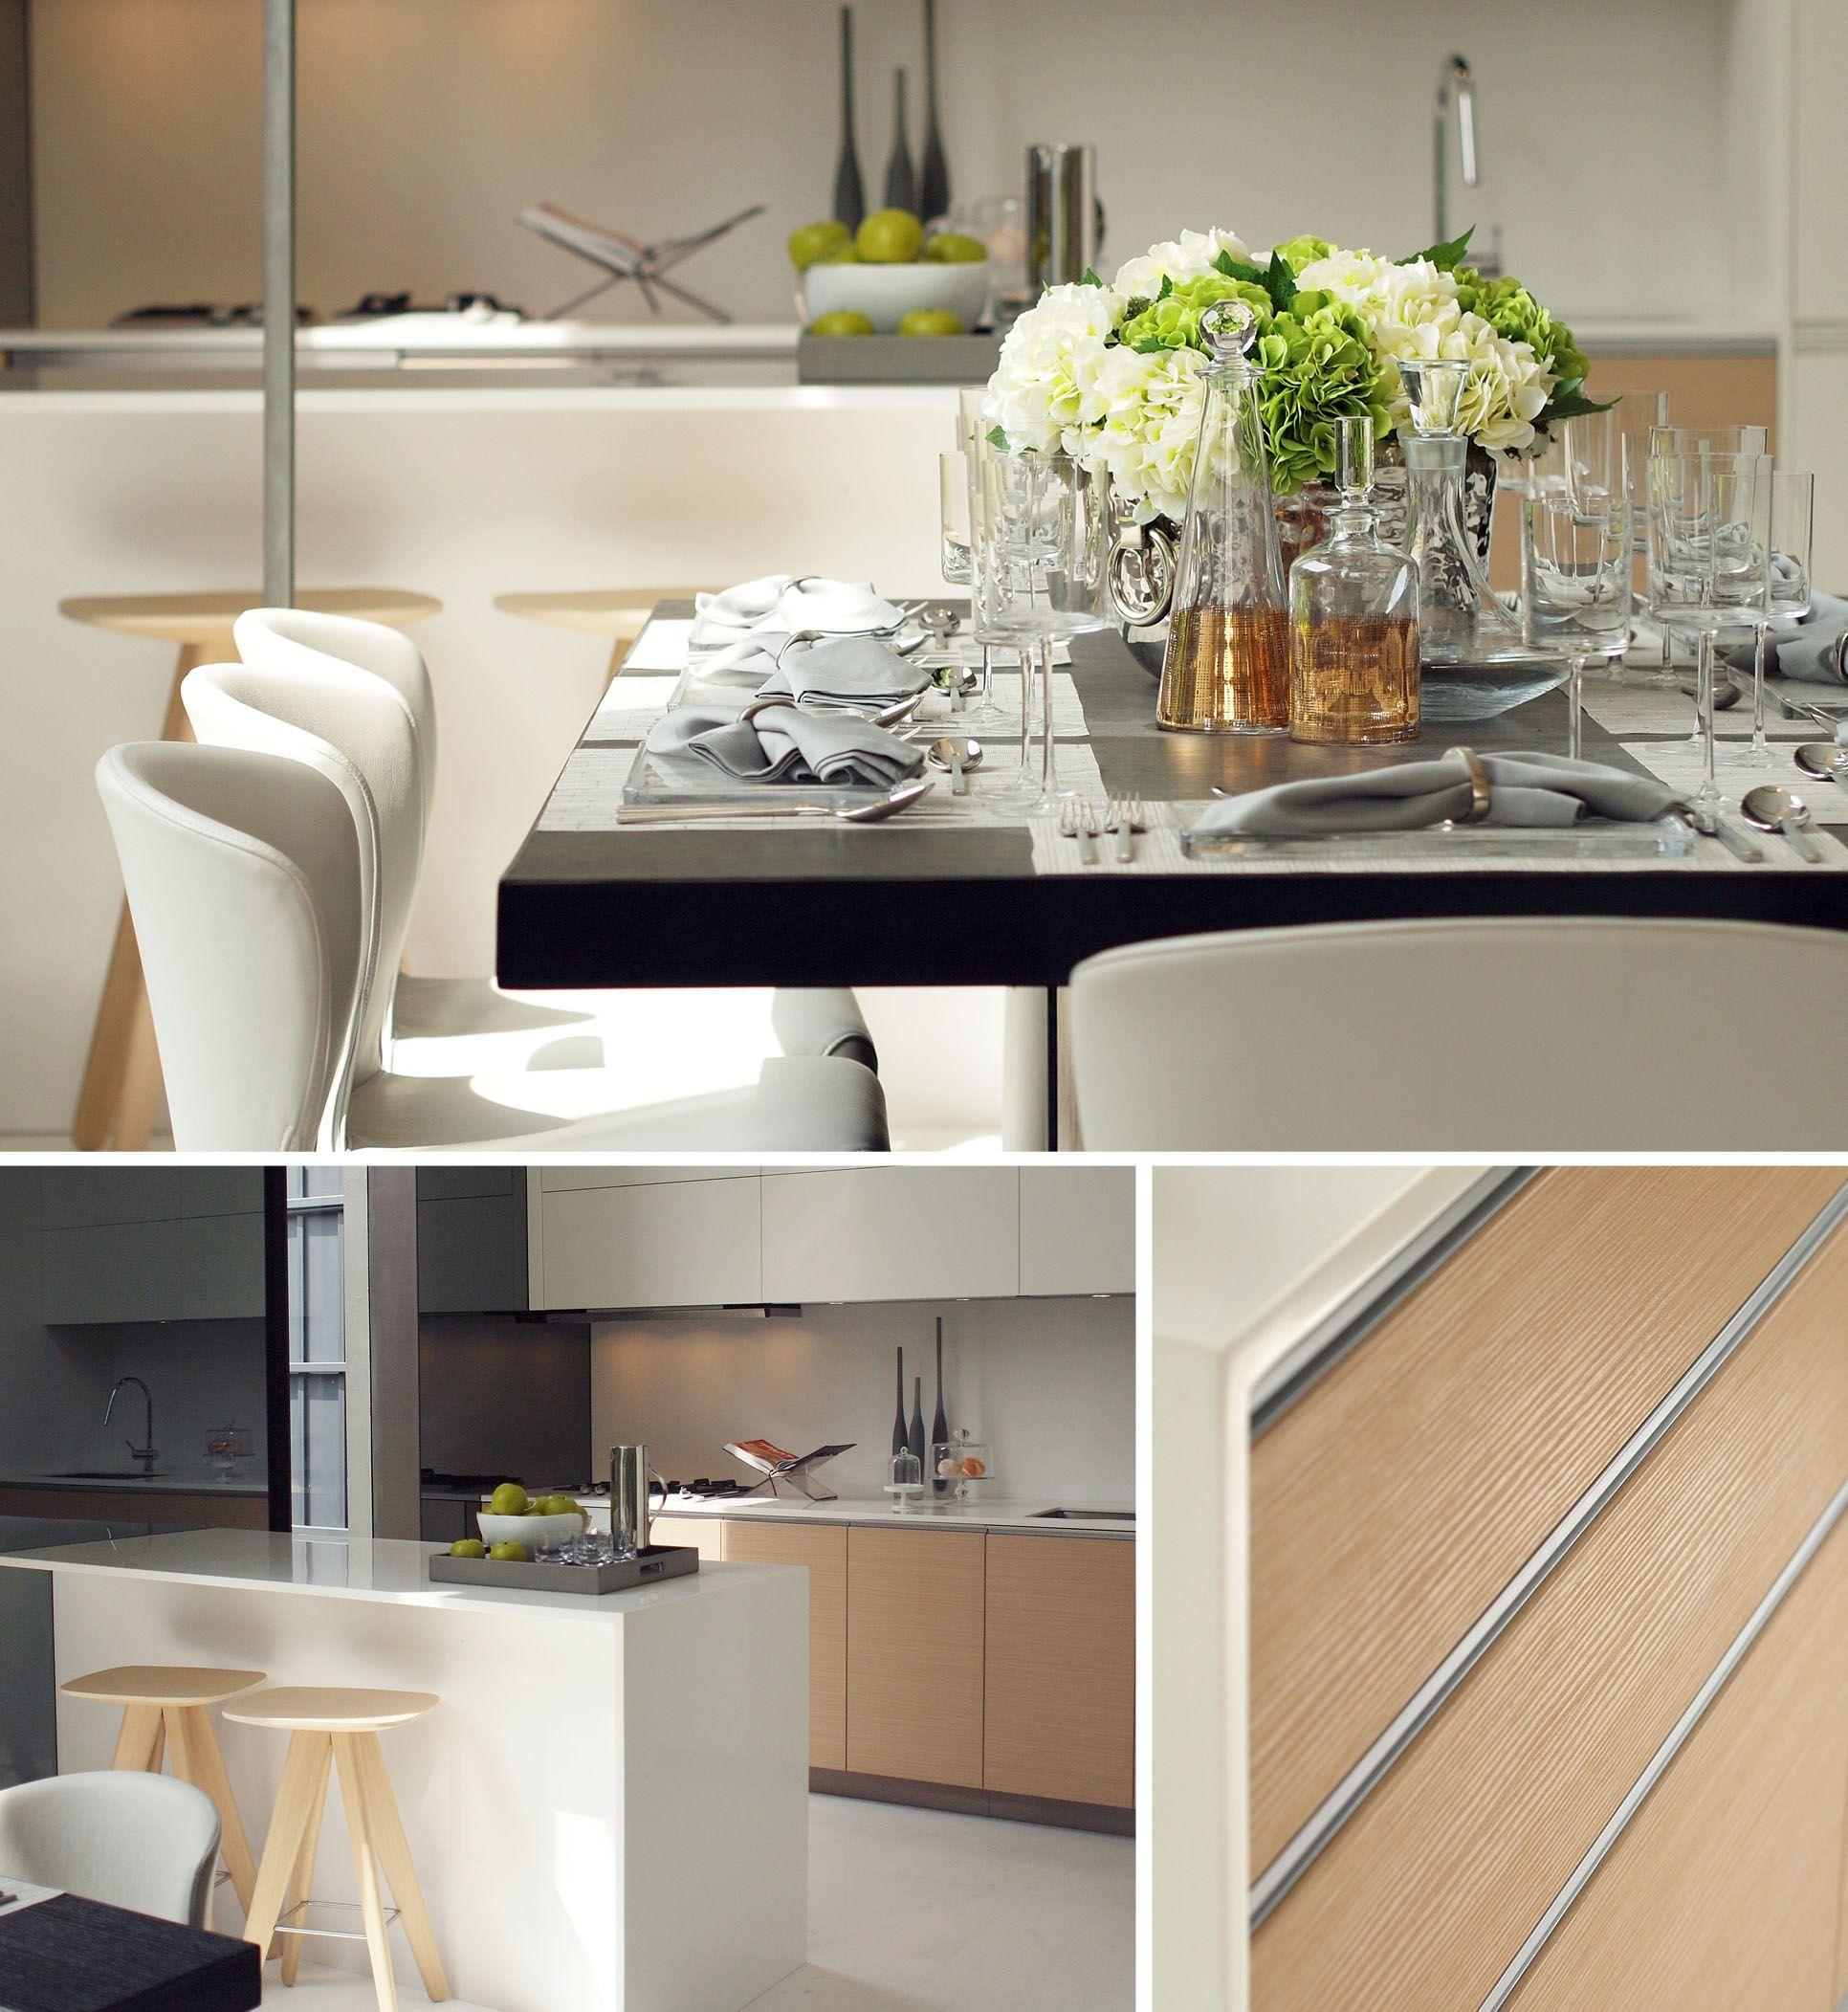 Kitchen Dining Room Interior Design: SCDA Cluny Park Residence, SIngapore